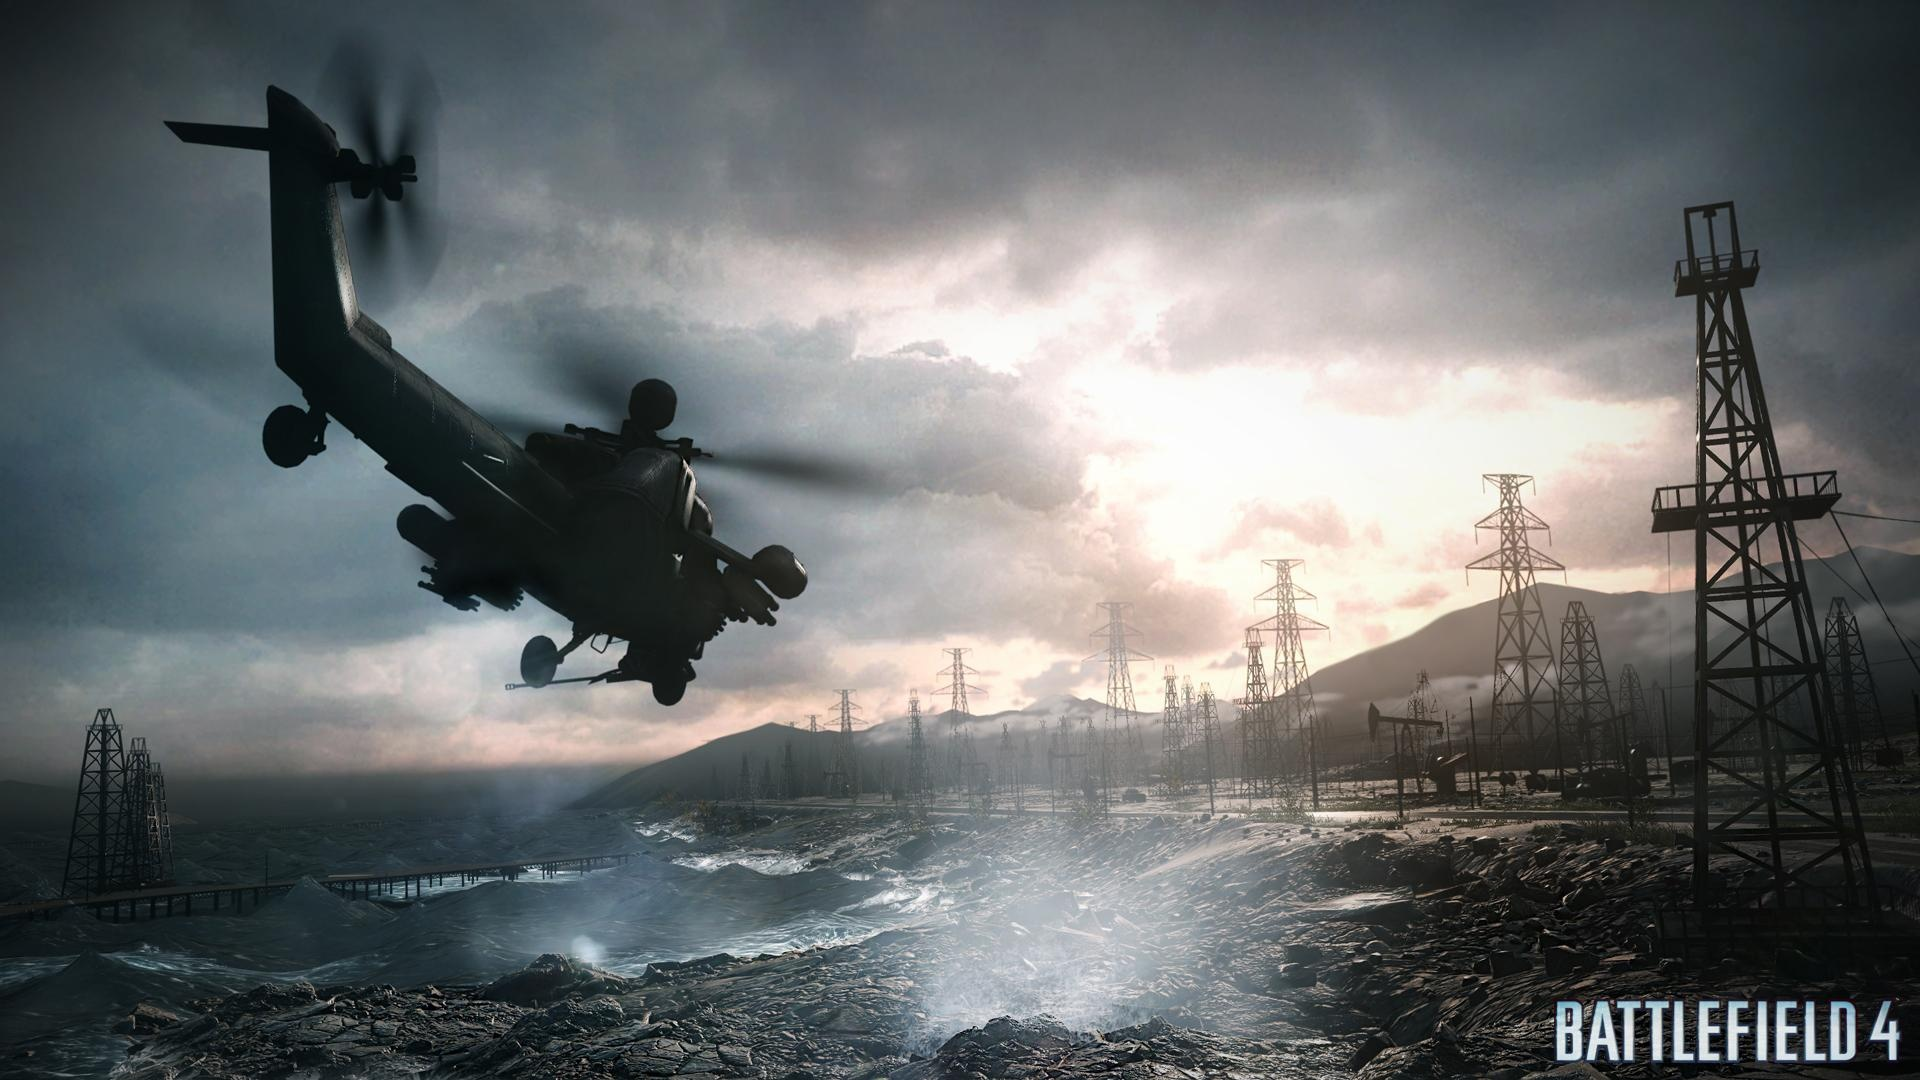 Battlefield4のヘリコプターと鉄塔